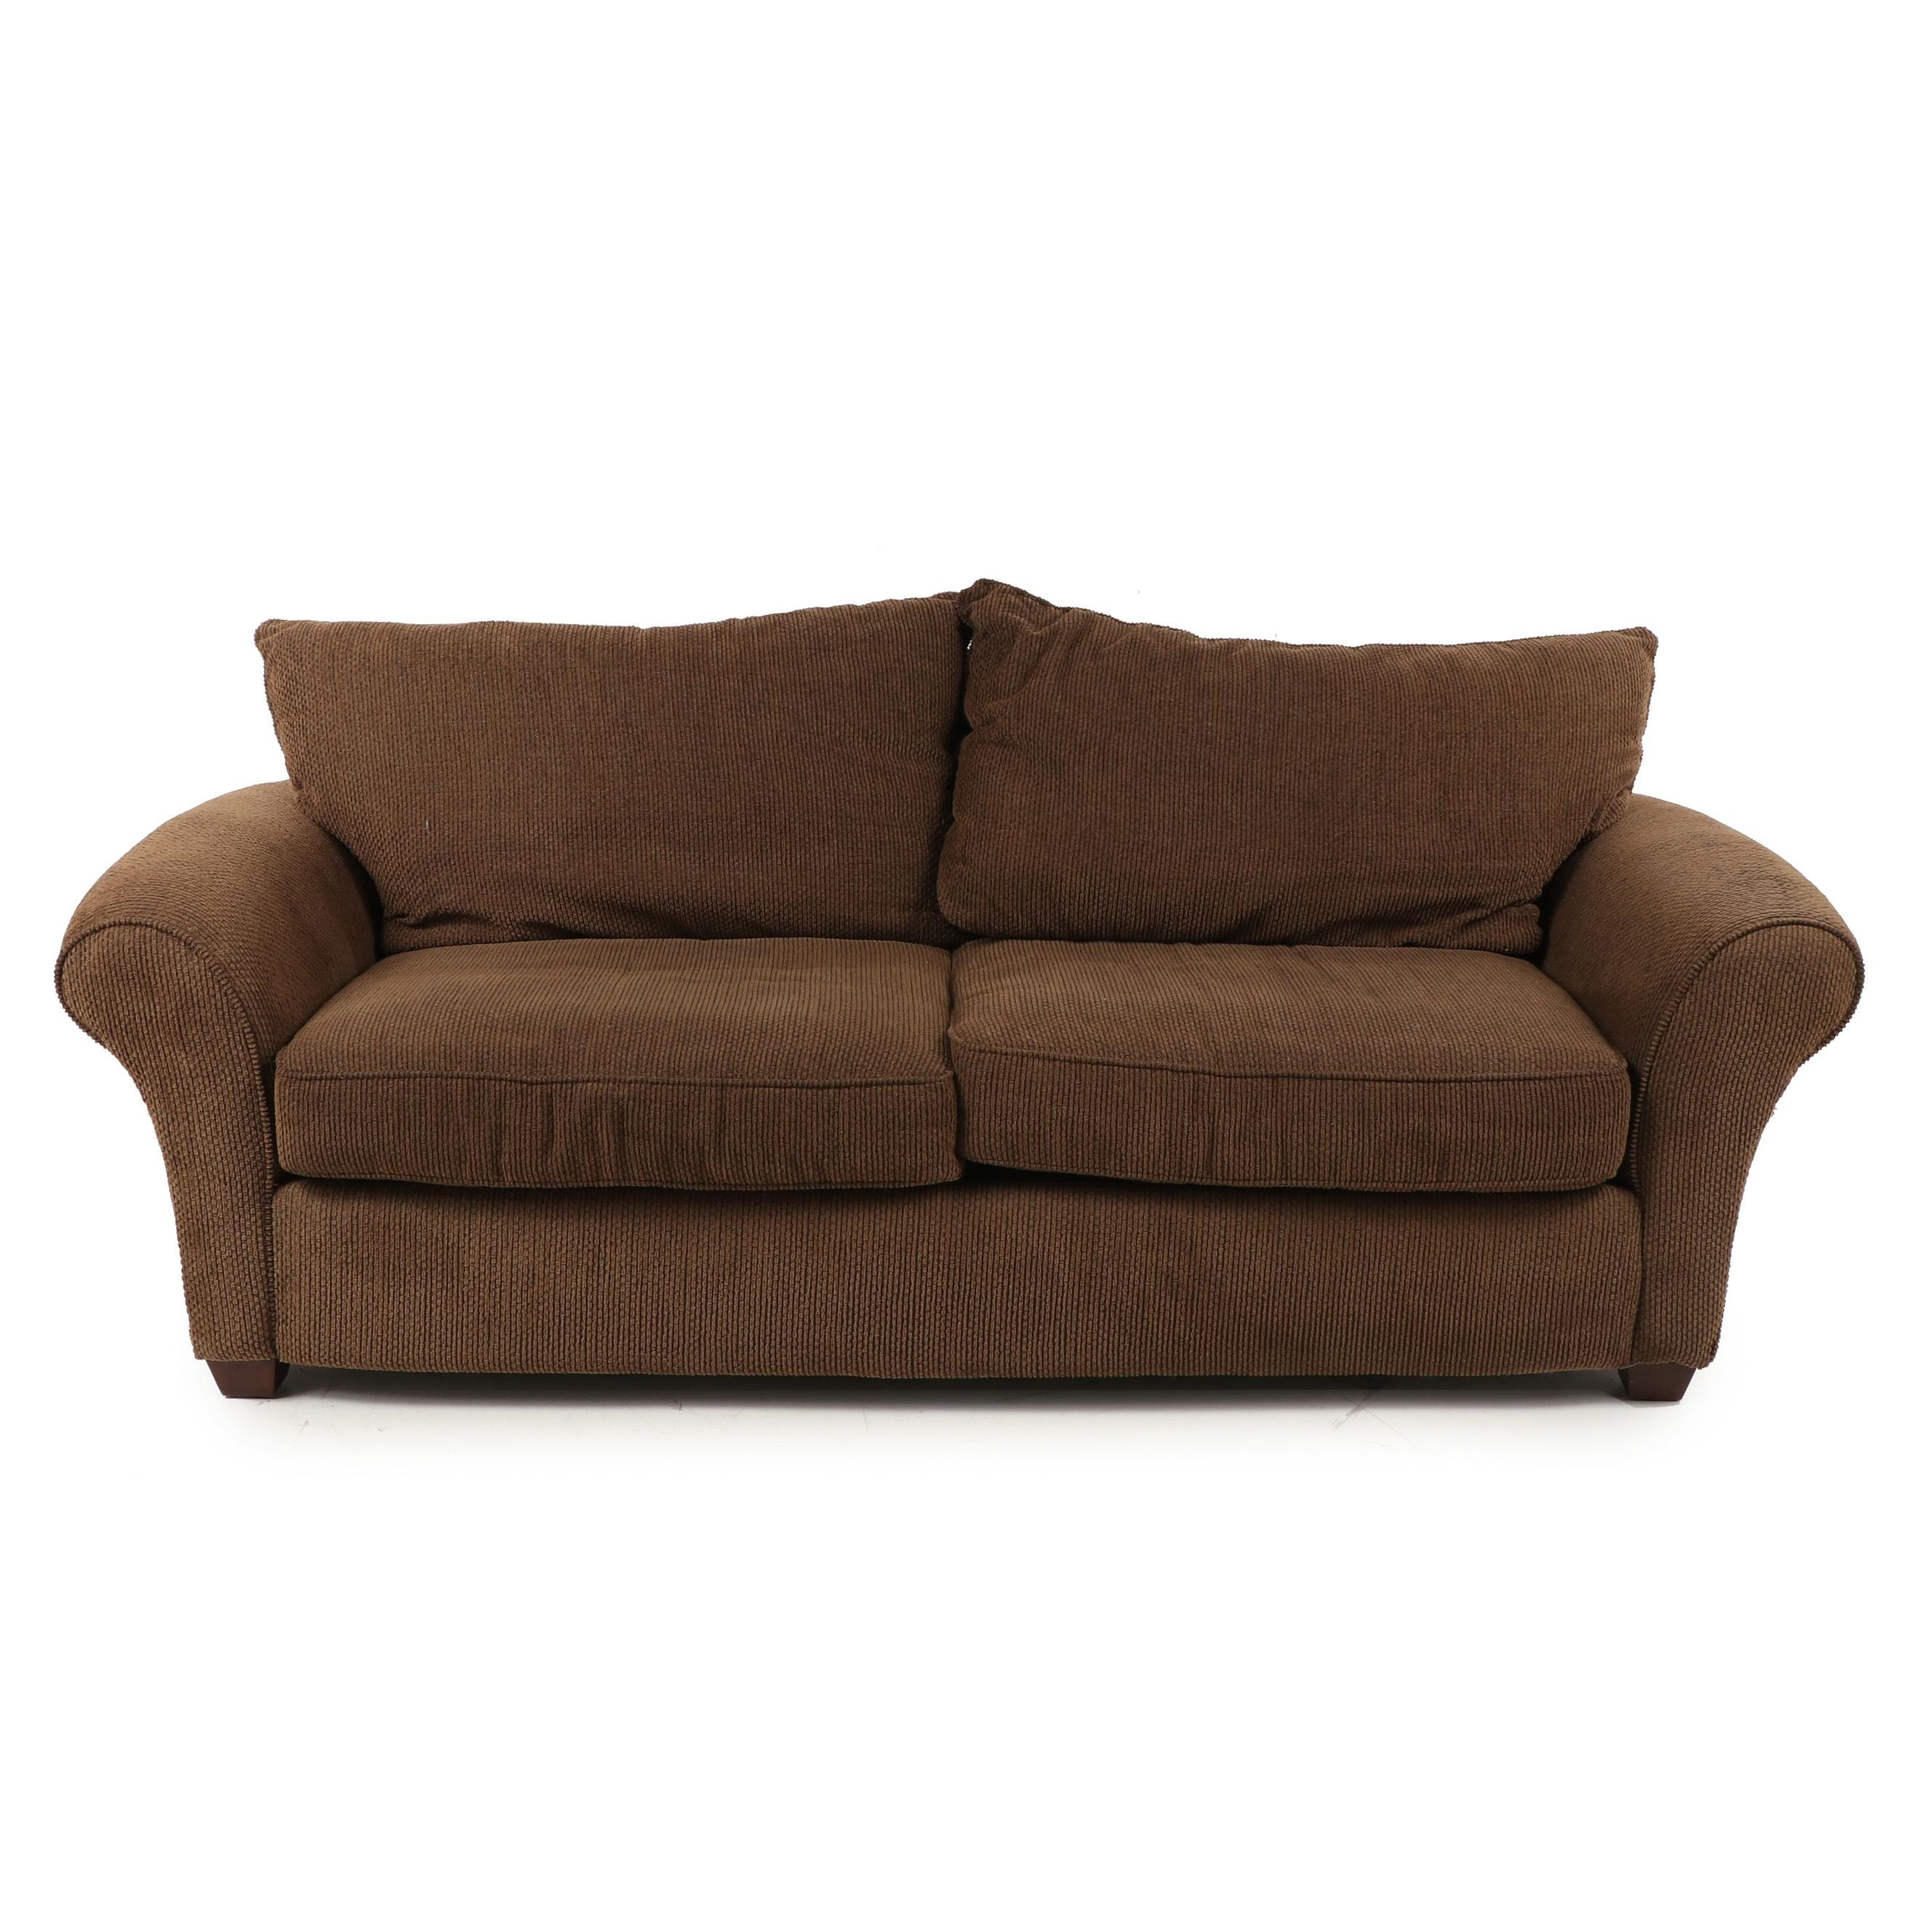 Alan White Upholstered Sofa, Late 20th Century